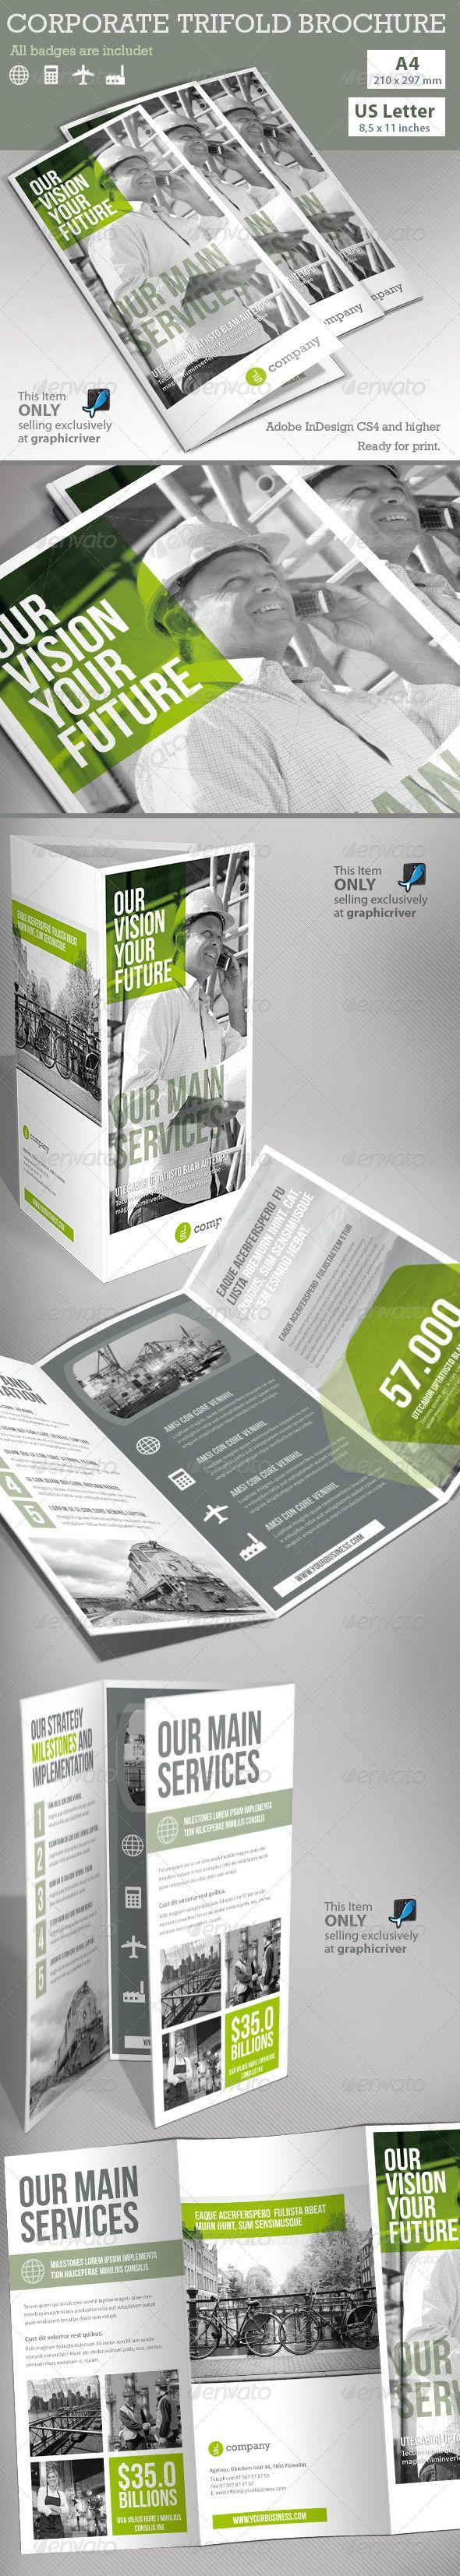 Corporate Tri-fold Brochure  - Print Templates